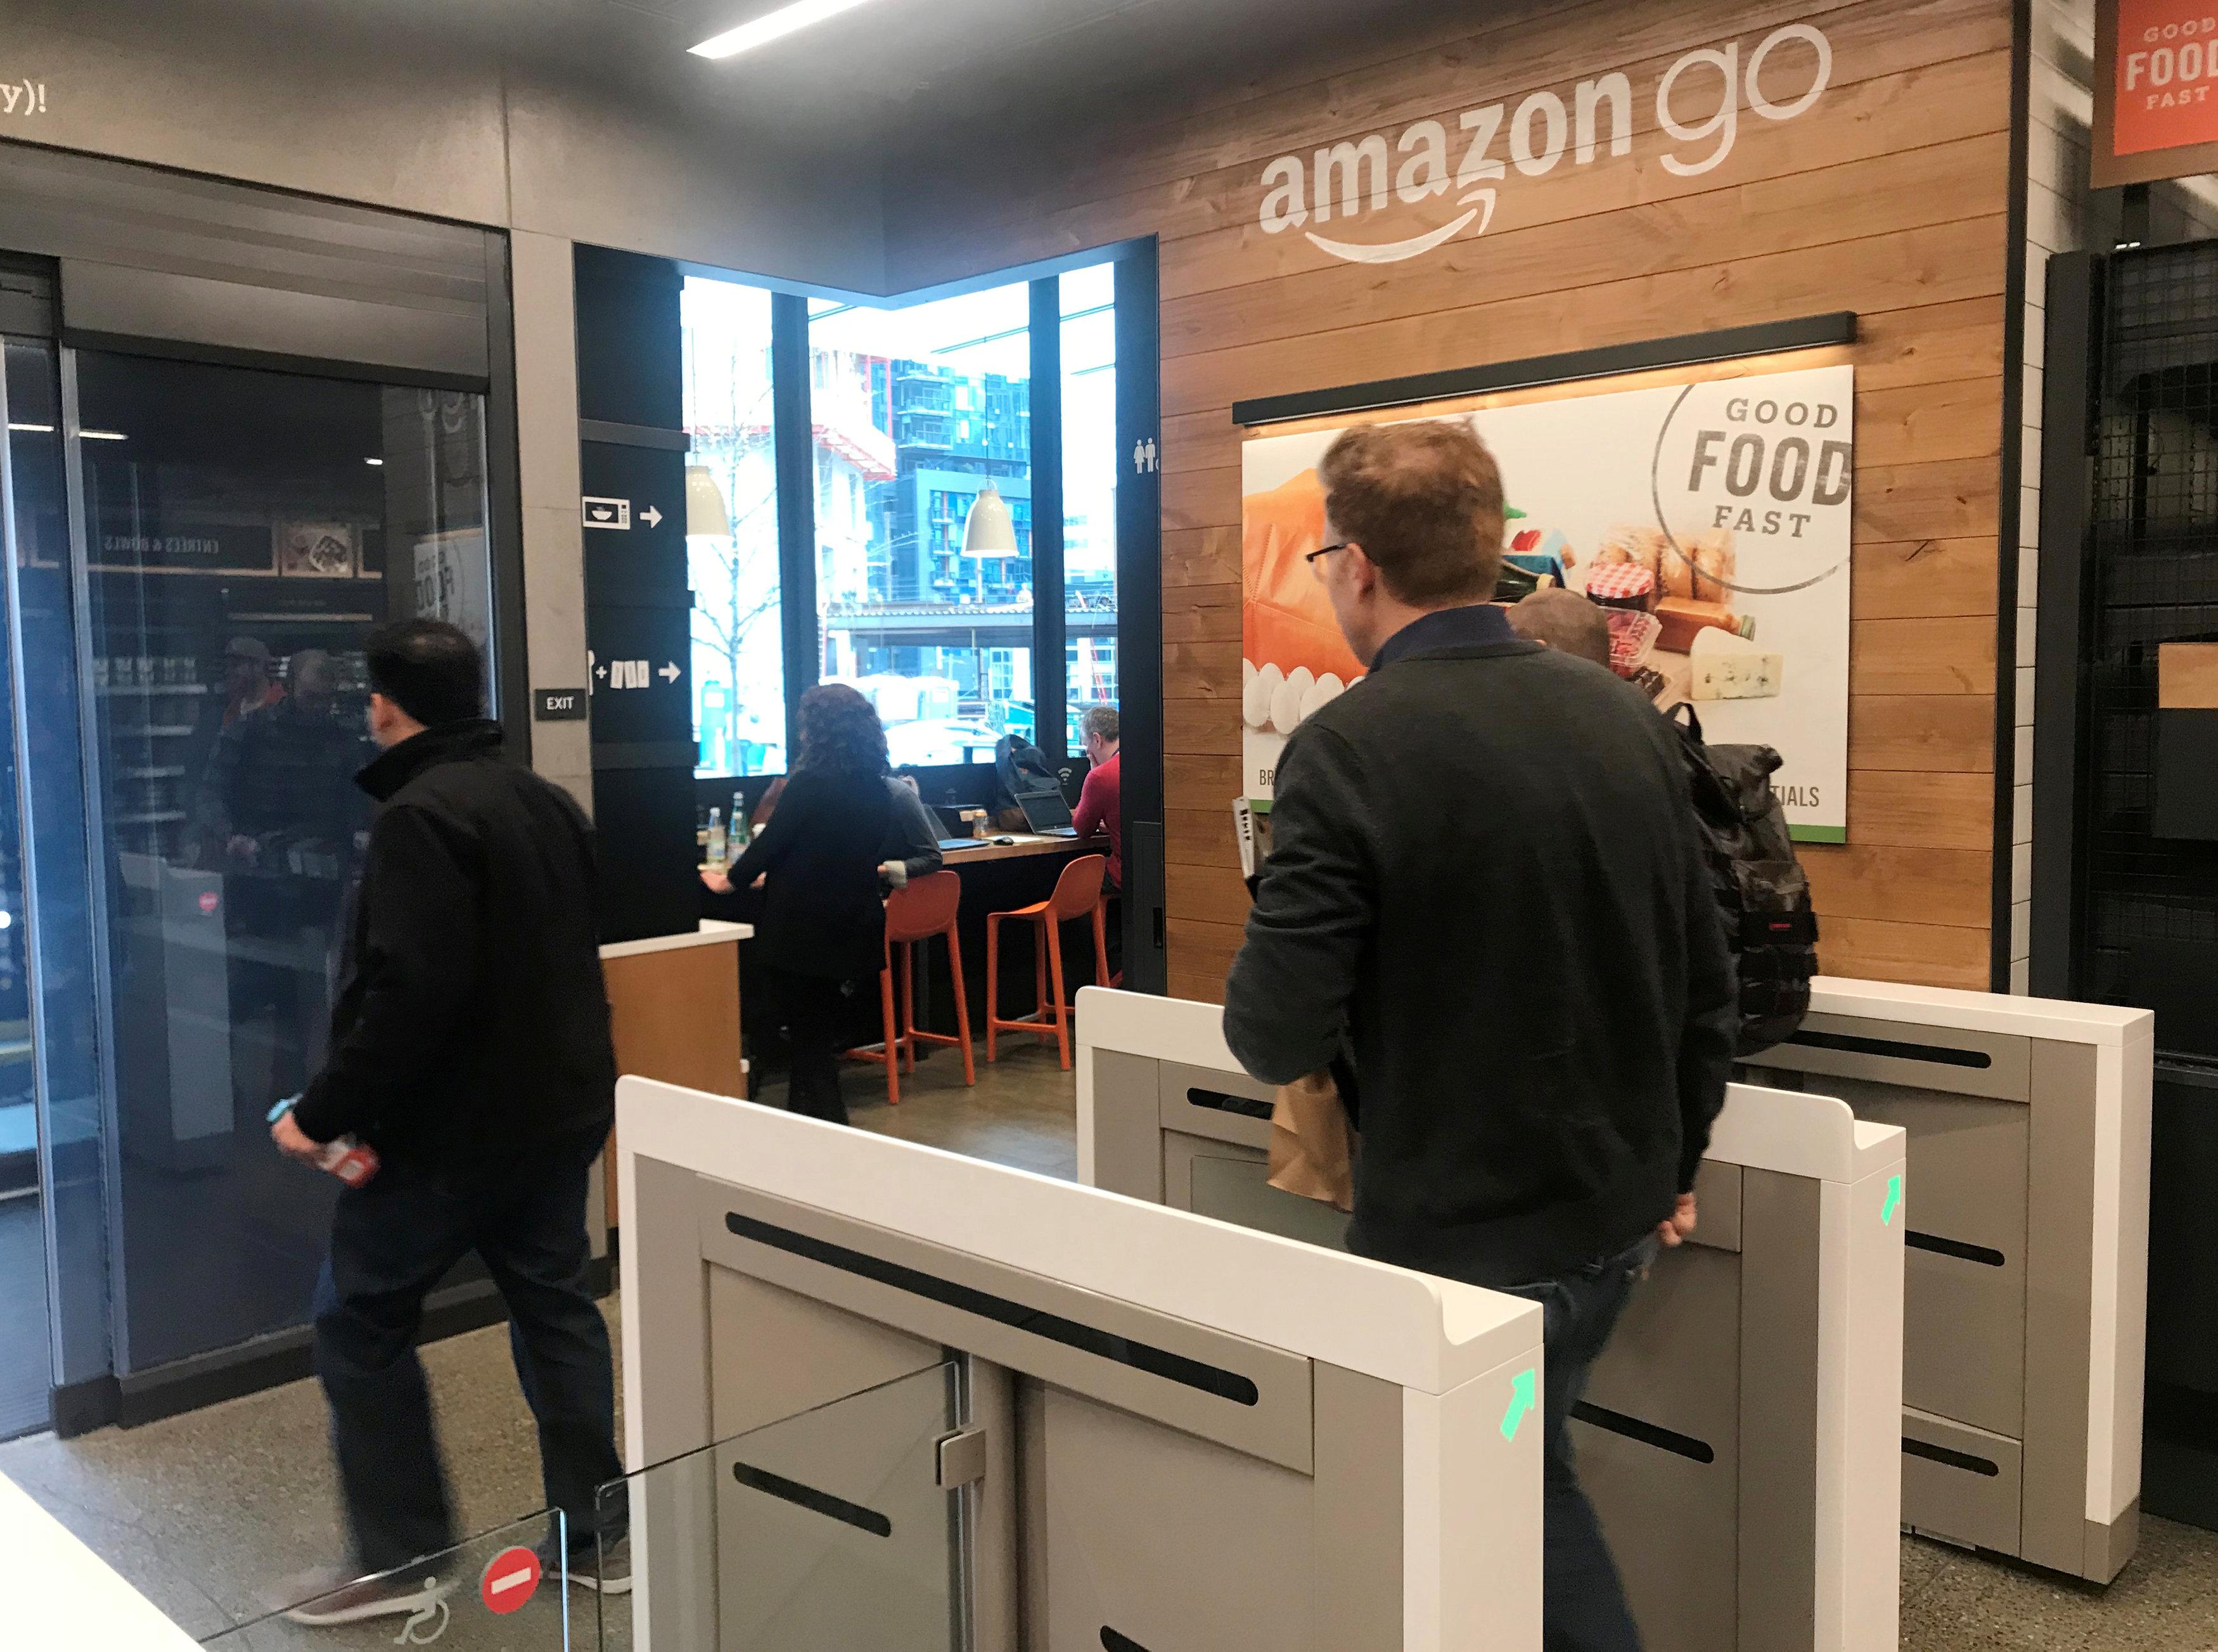 washingtonpost.com - Rachel Siegel - Why Amazon Go could swoop into airport retail